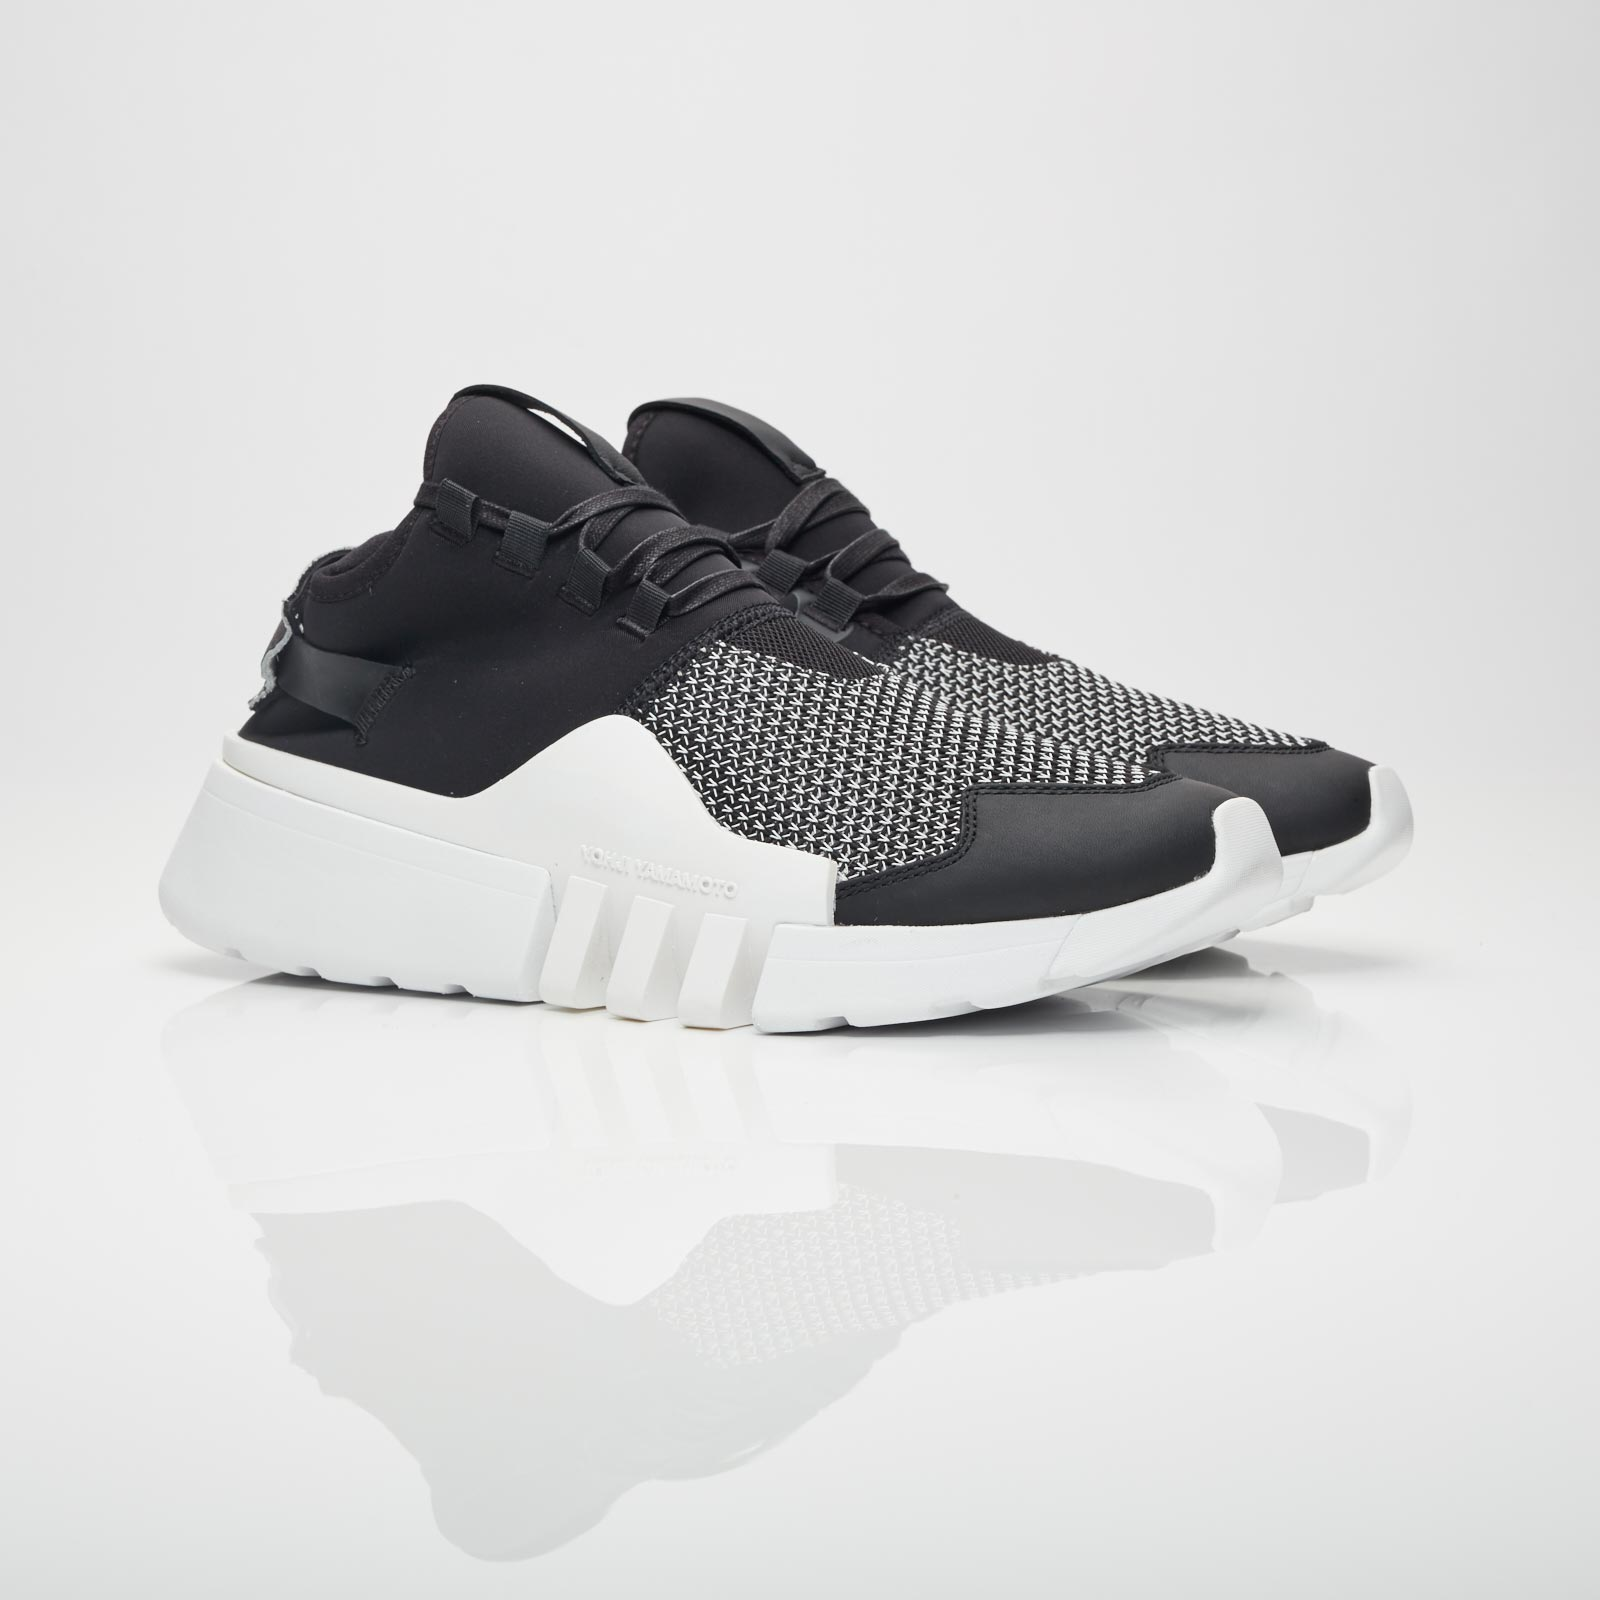 Adidas Y-3 City Sock Primeknit Black White Men's Shoes